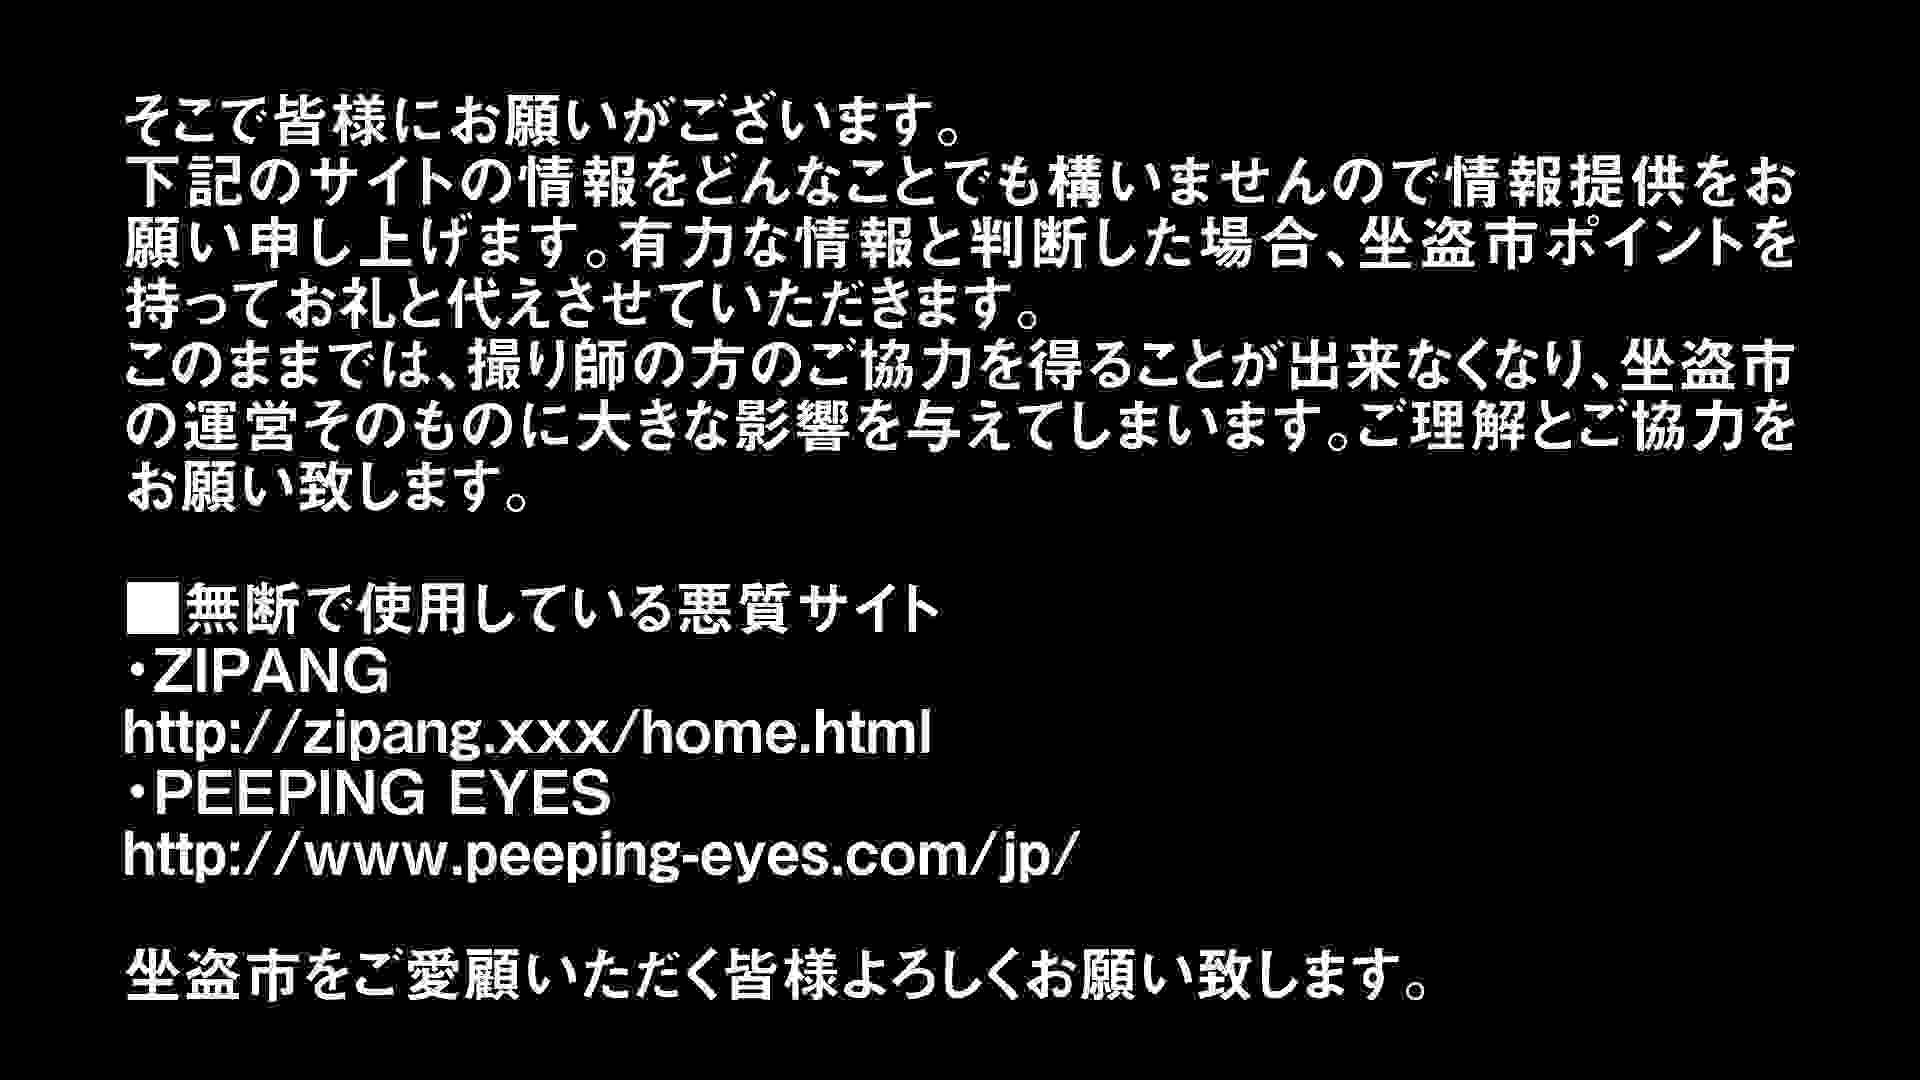 Aquaな露天風呂Vol.302 露天風呂突入 ヌード画像 82pic 26